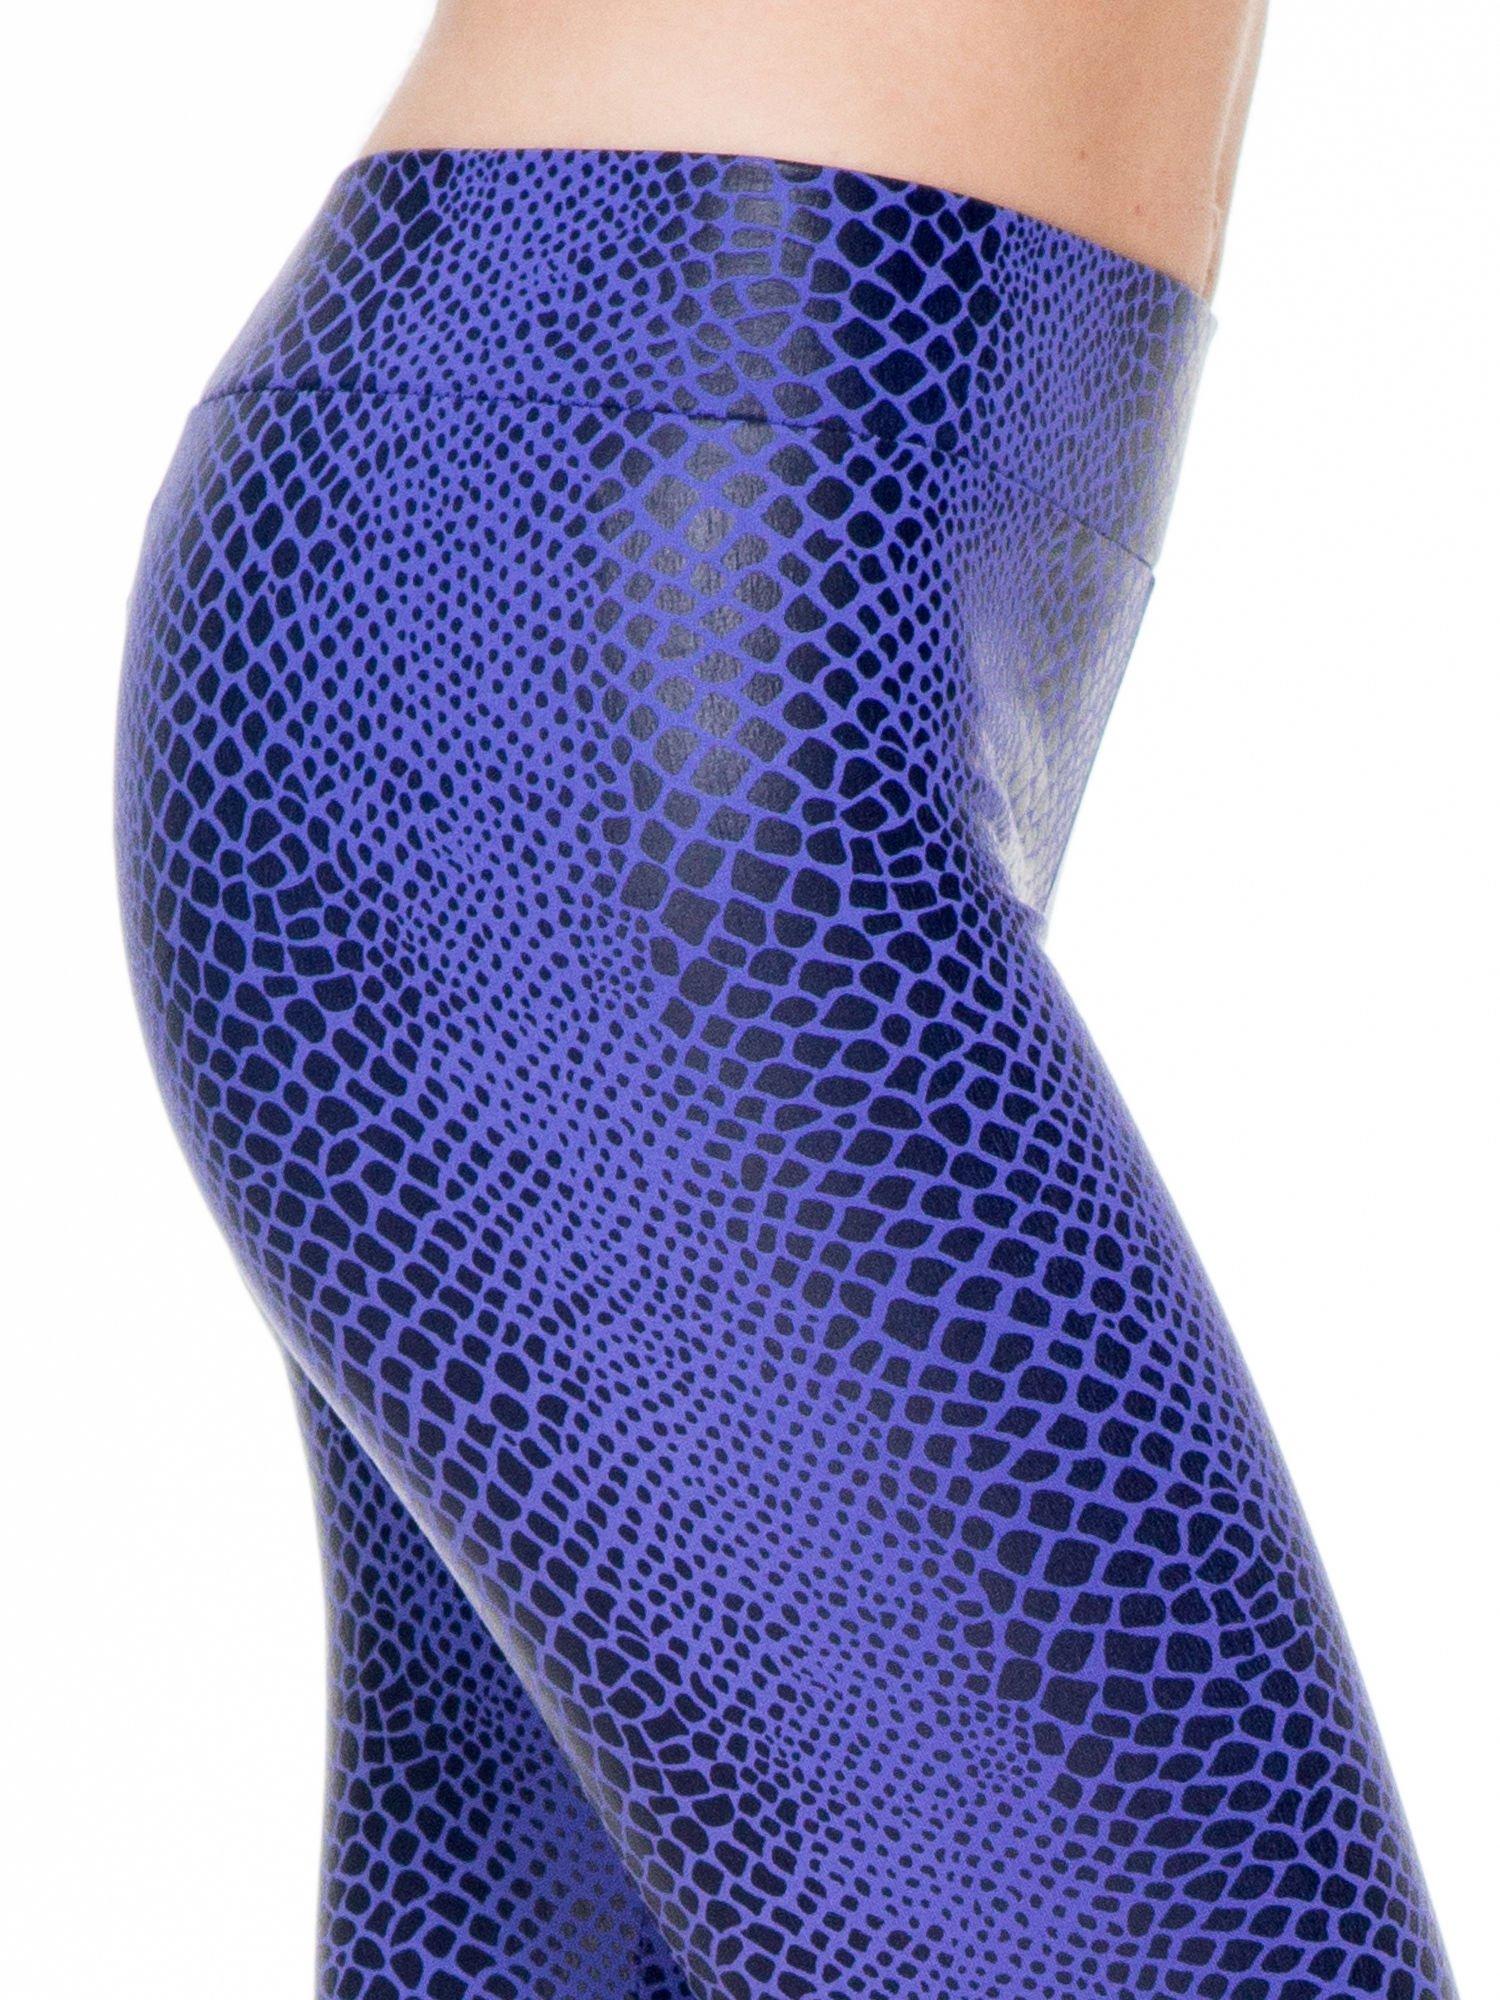 Fioletowe legginsy z efektem skóry krokodyla                                  zdj.                                  5